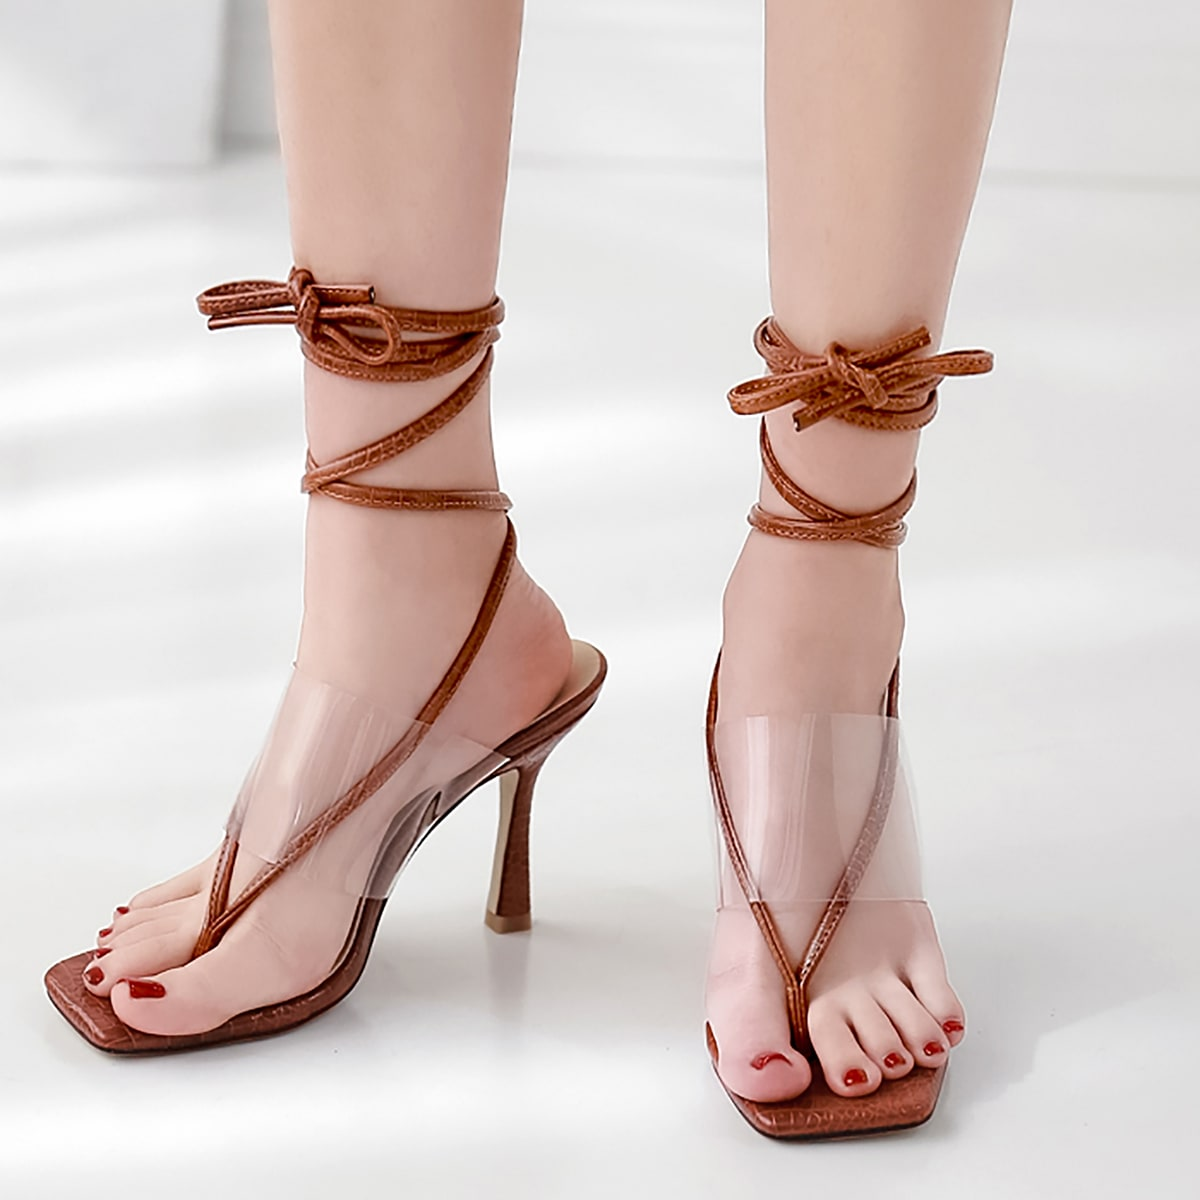 Сандалии минималистичный сланцы на каблуке